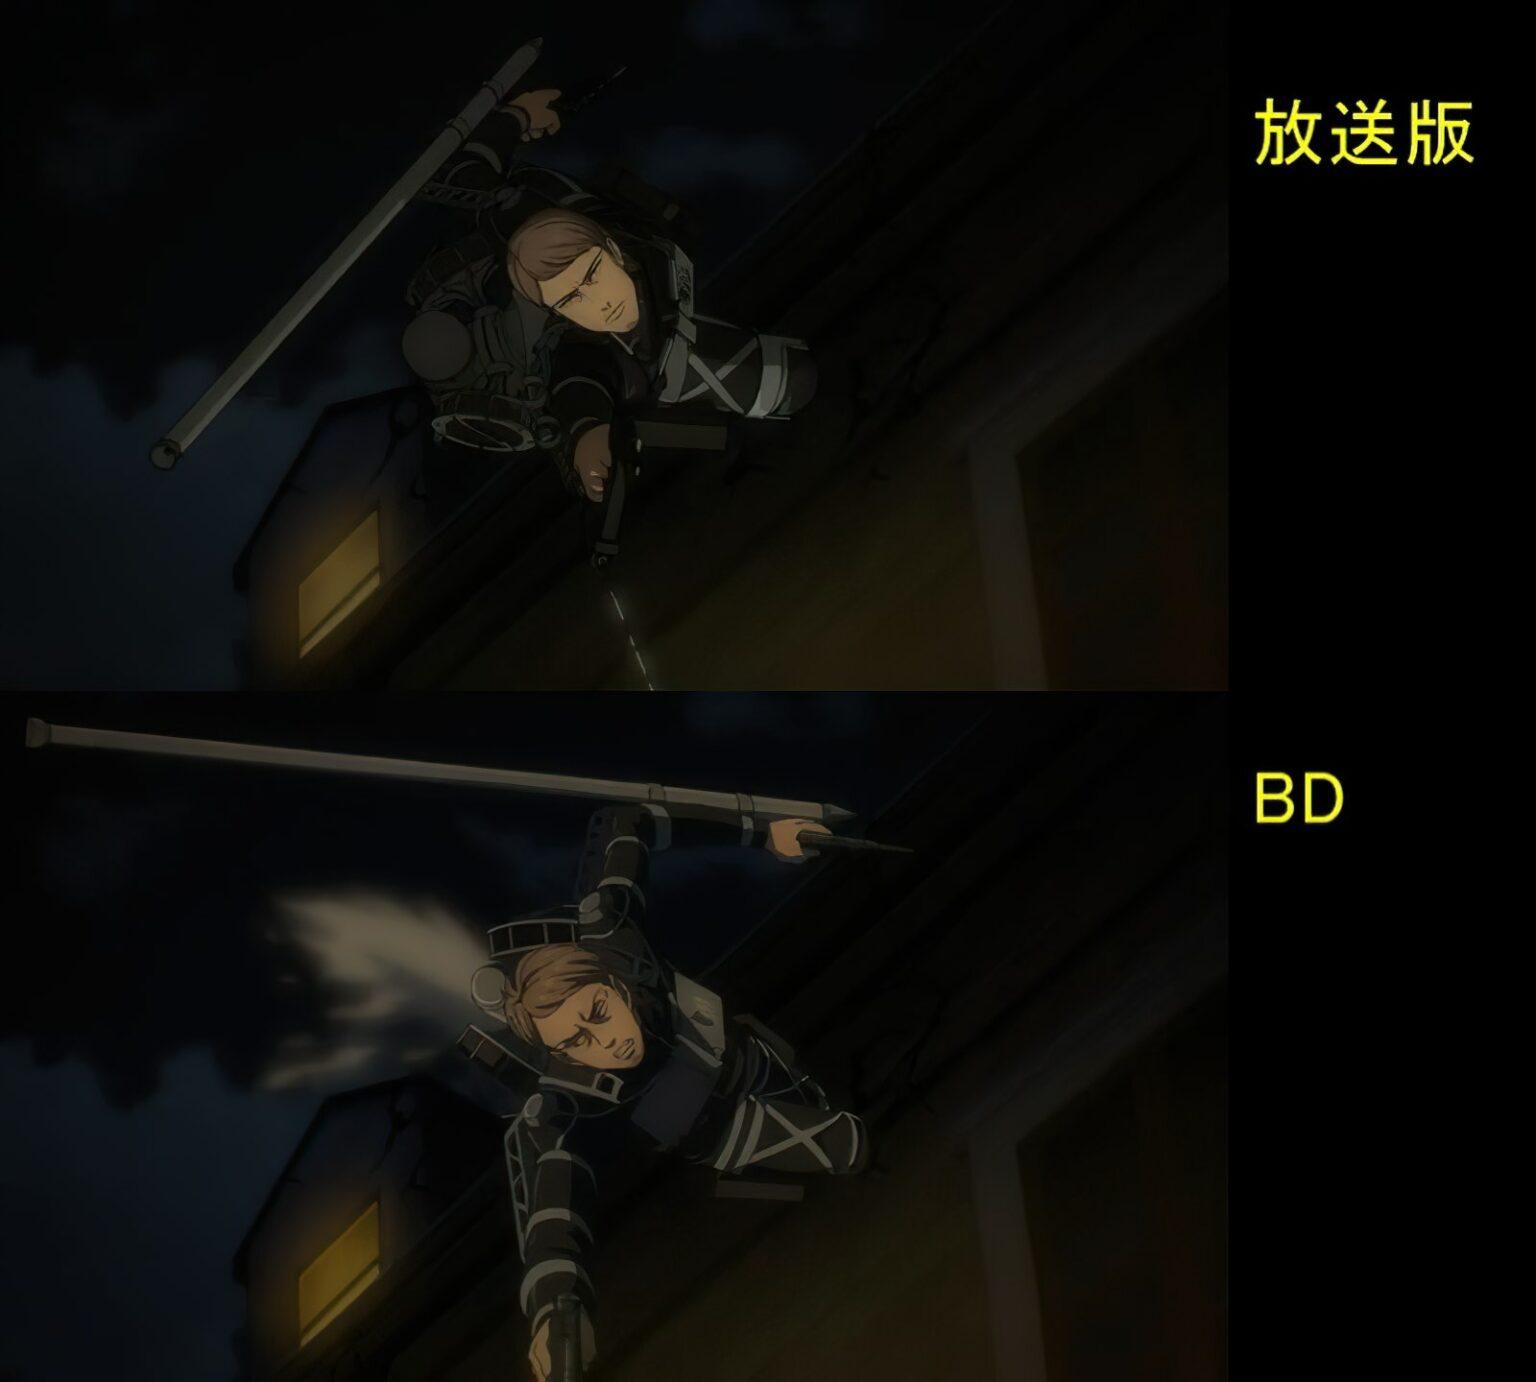 A8 3 1536x1382 - Correções do Anime Shingeki no Kyojin: The Final Season no Blu-ray/DVD.